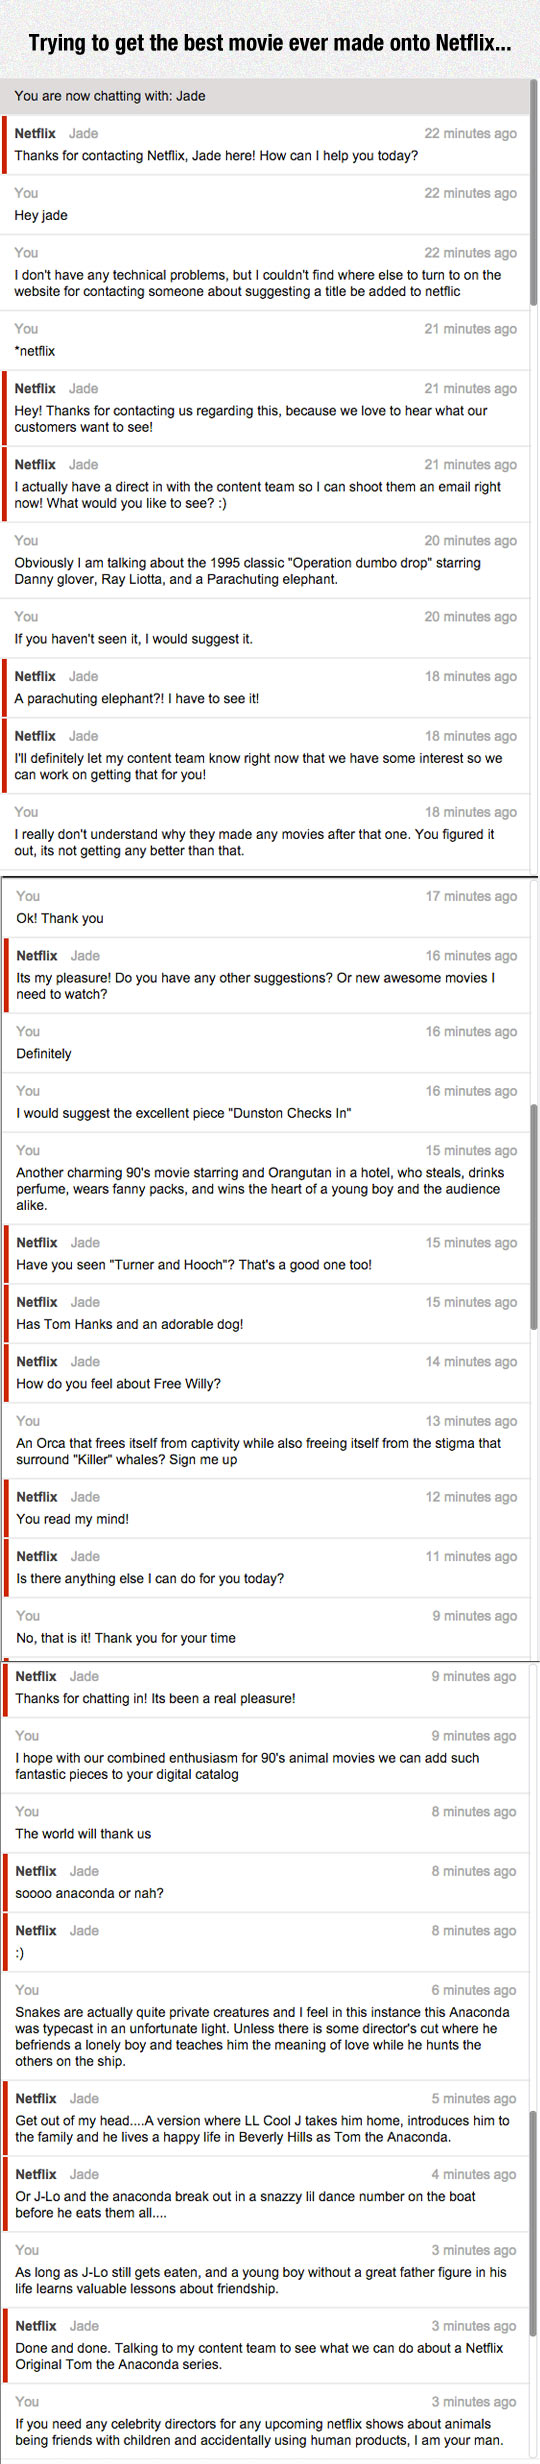 Make It Happen, Netflix